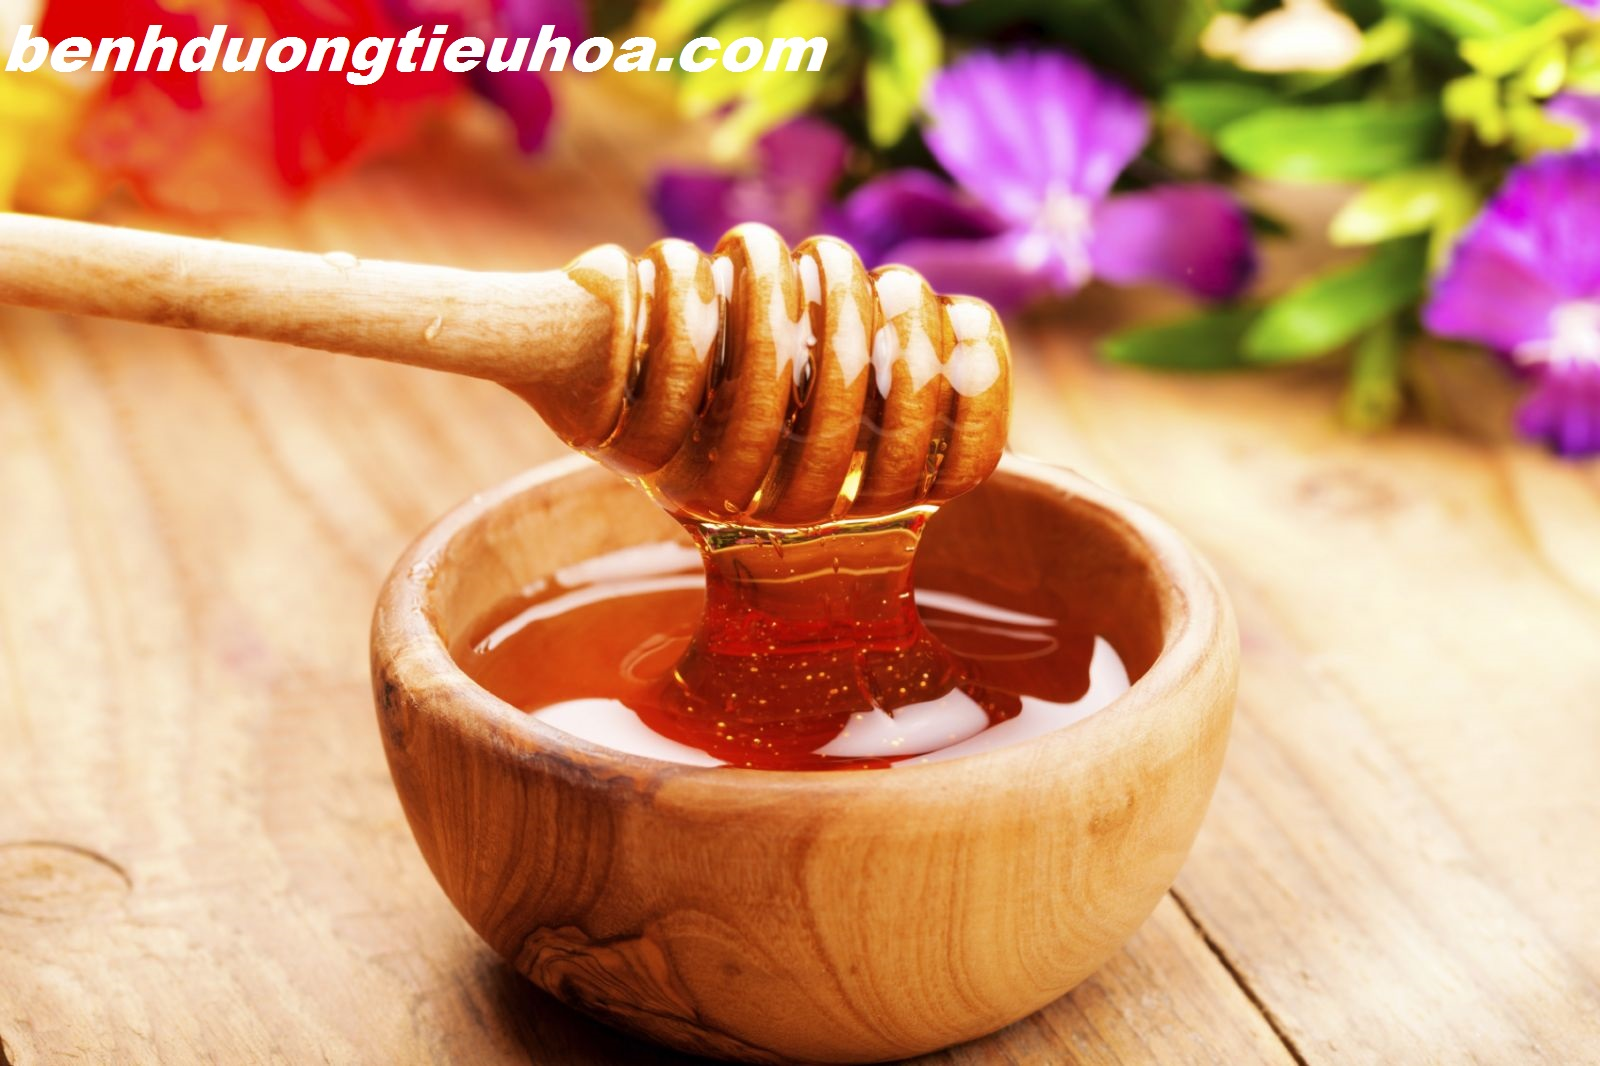 khoi-han-chung-benh-tao-bon-nang (1)